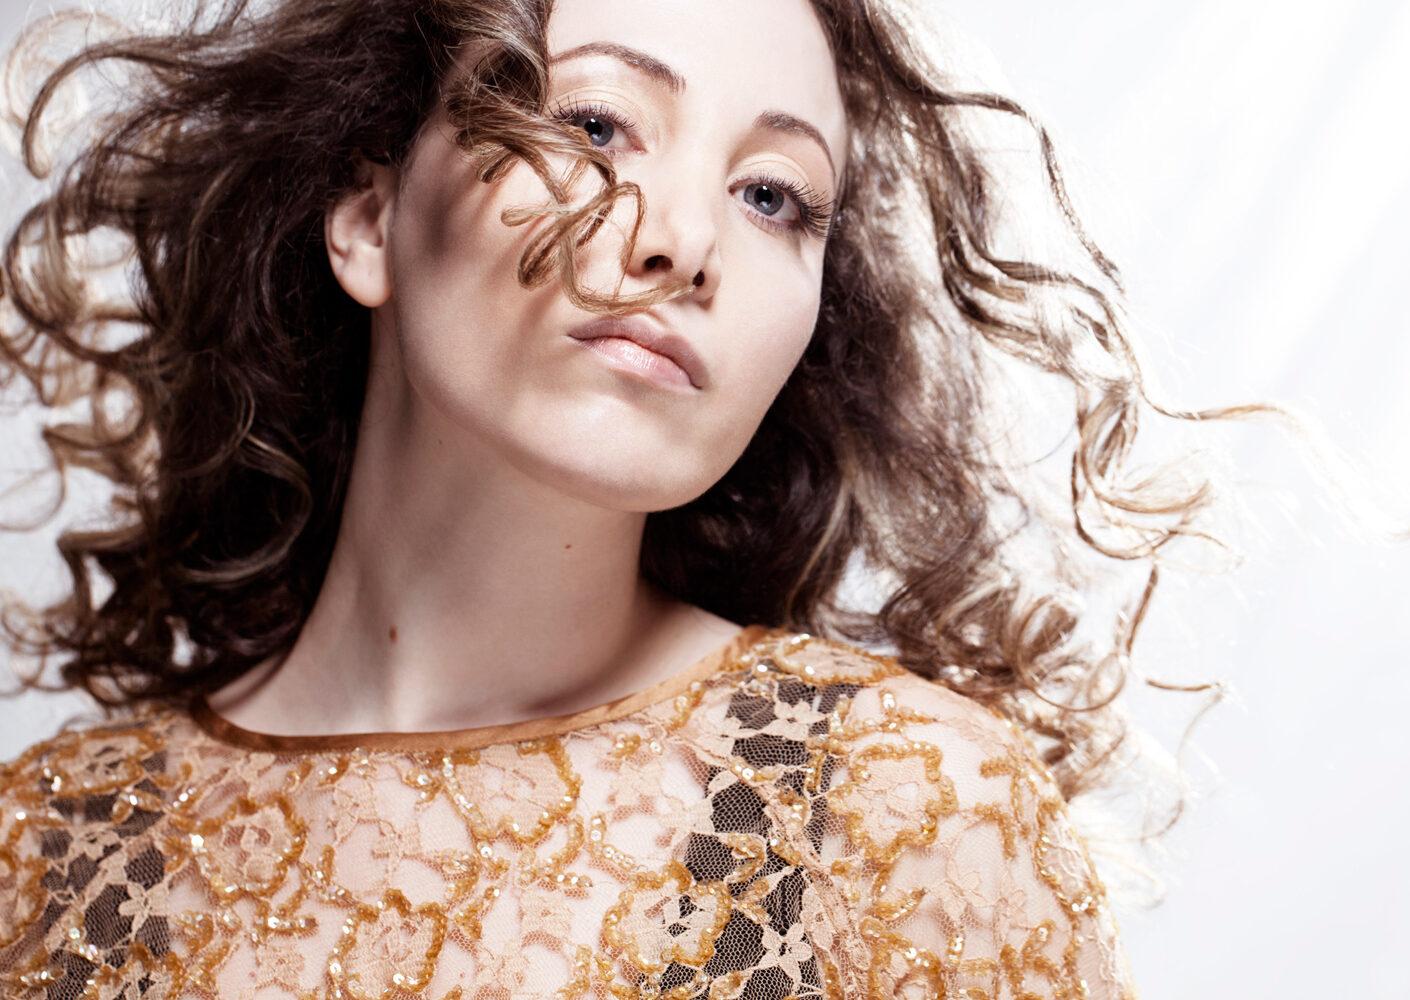 Photo: image by London fashion photographer, studio portrait of musician singer Eleni by British Fashion Photographer Margaret Yescombe